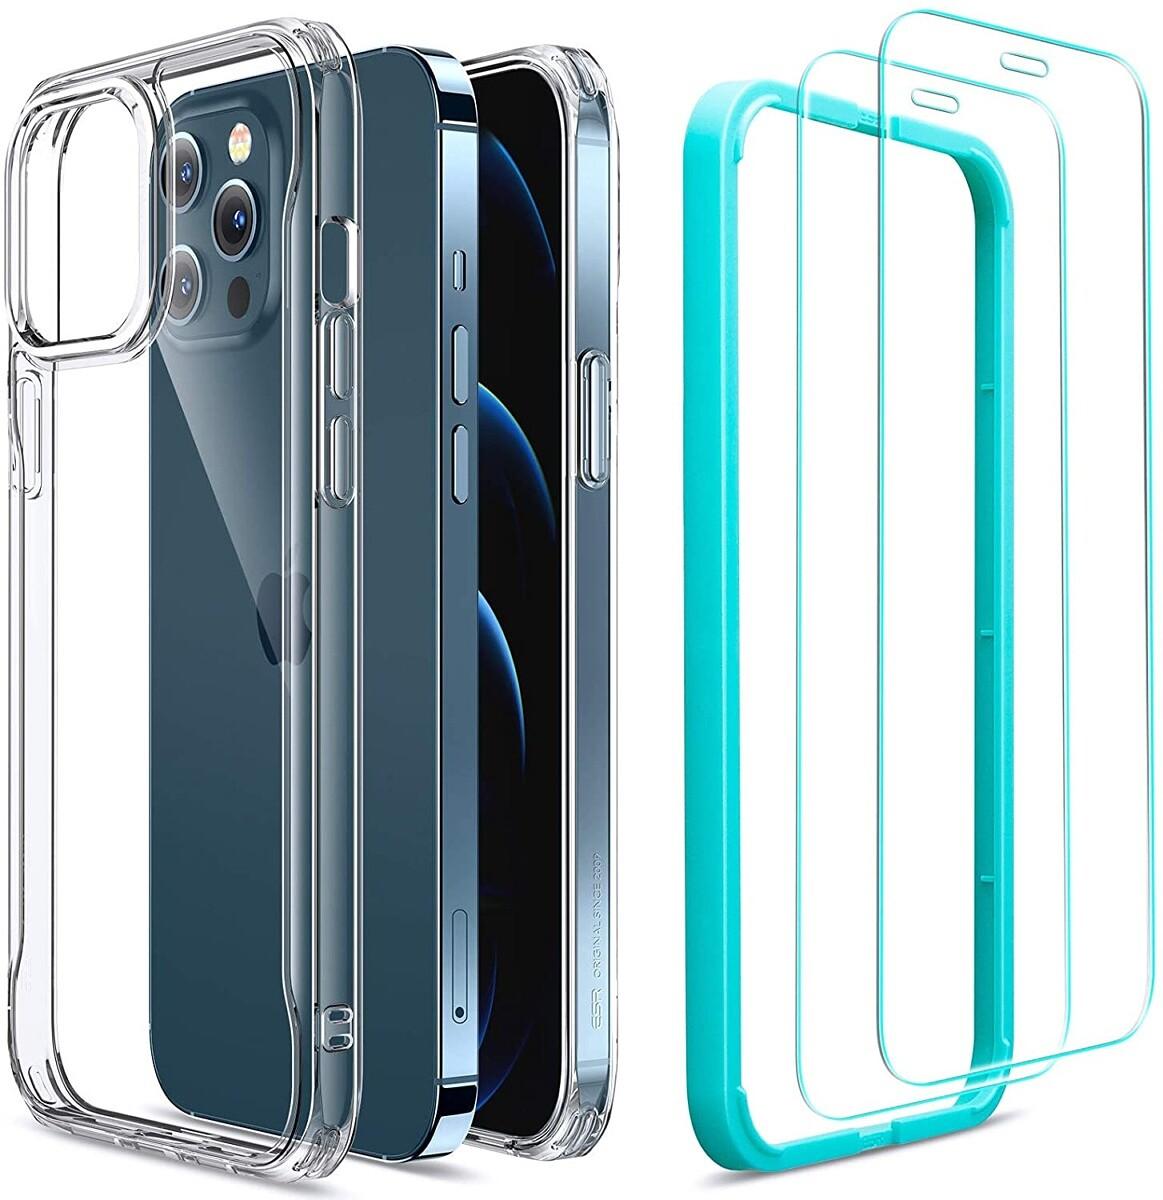 ESR Sidekick Case for iPhone 12/iPhone 12 Pro